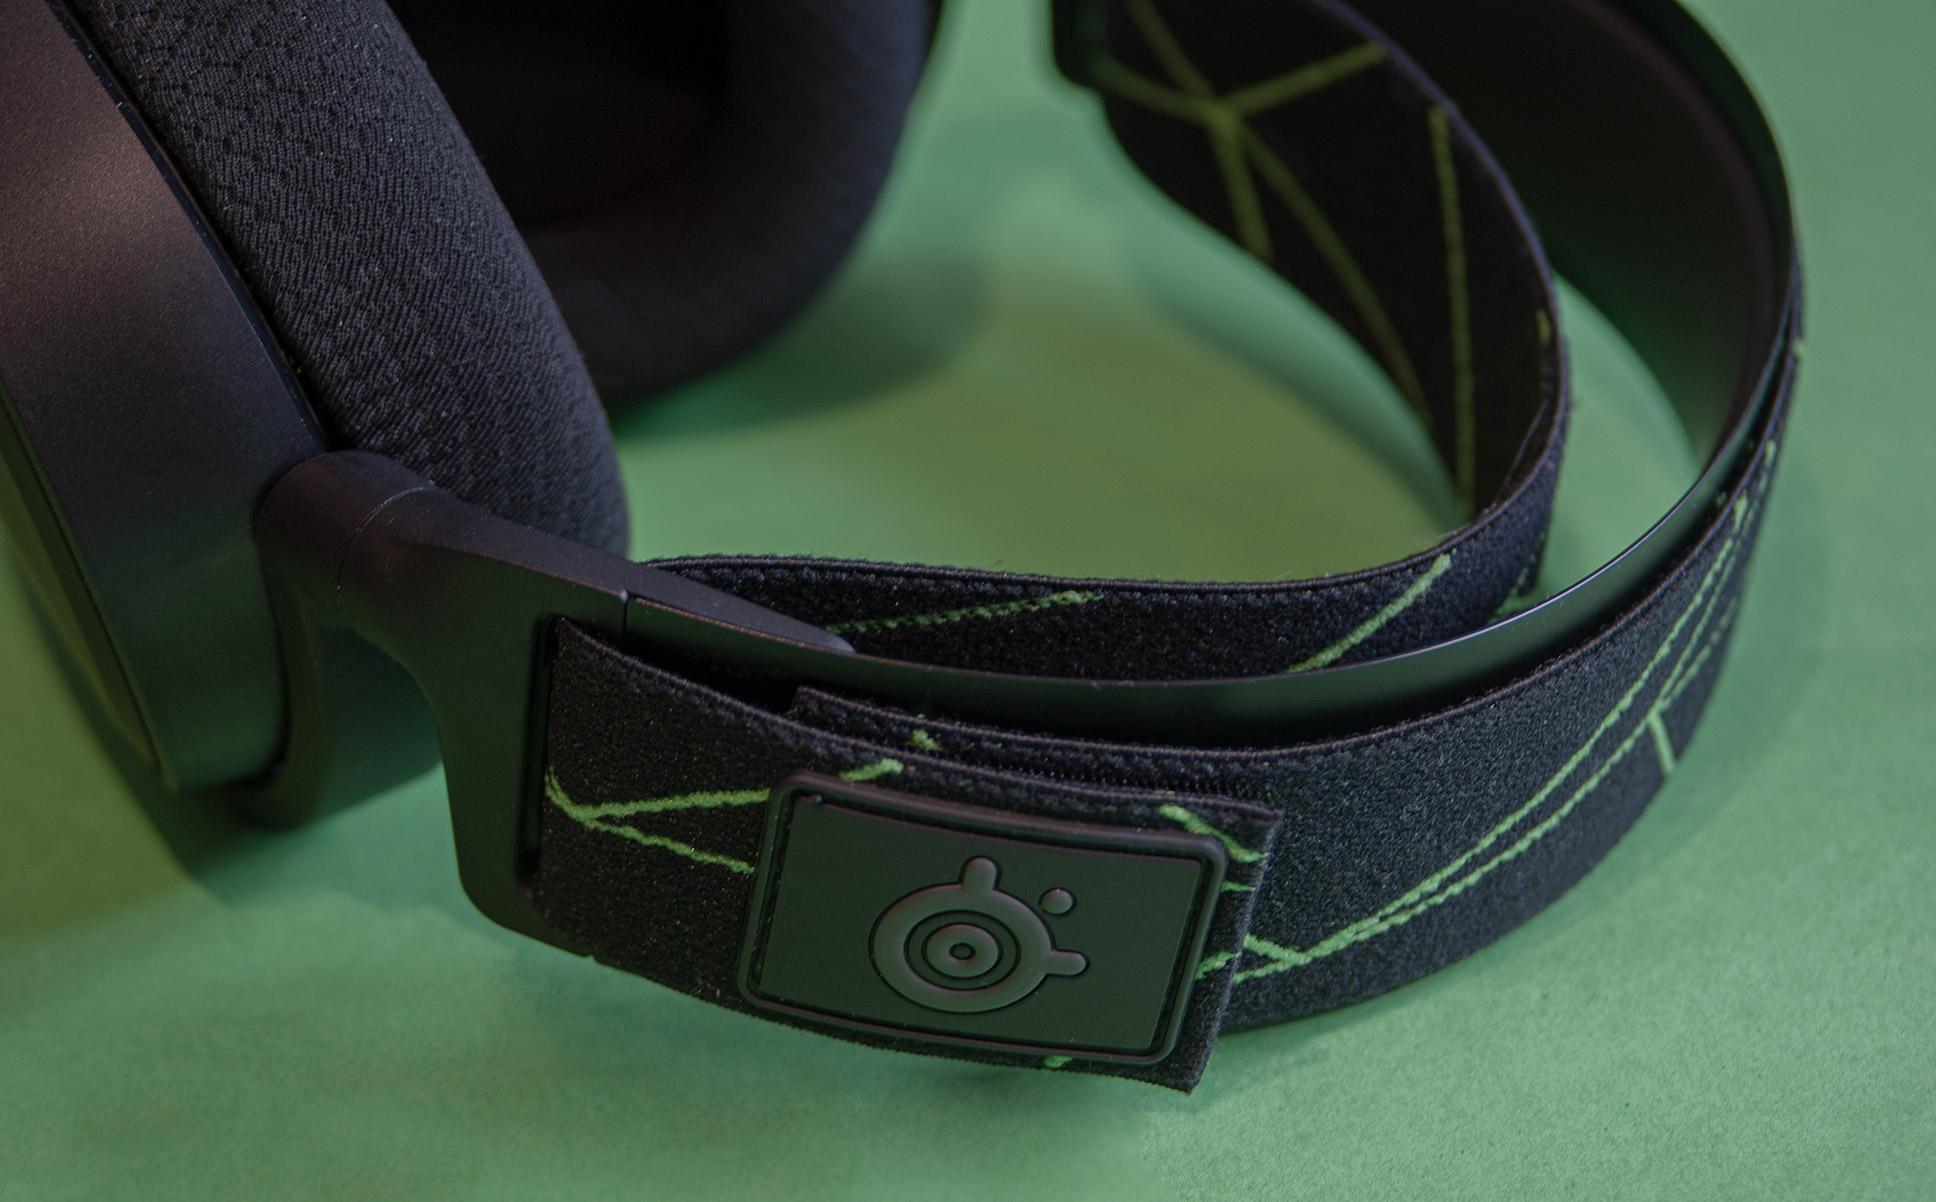 słuchawki steelseries arctis 7x headphones